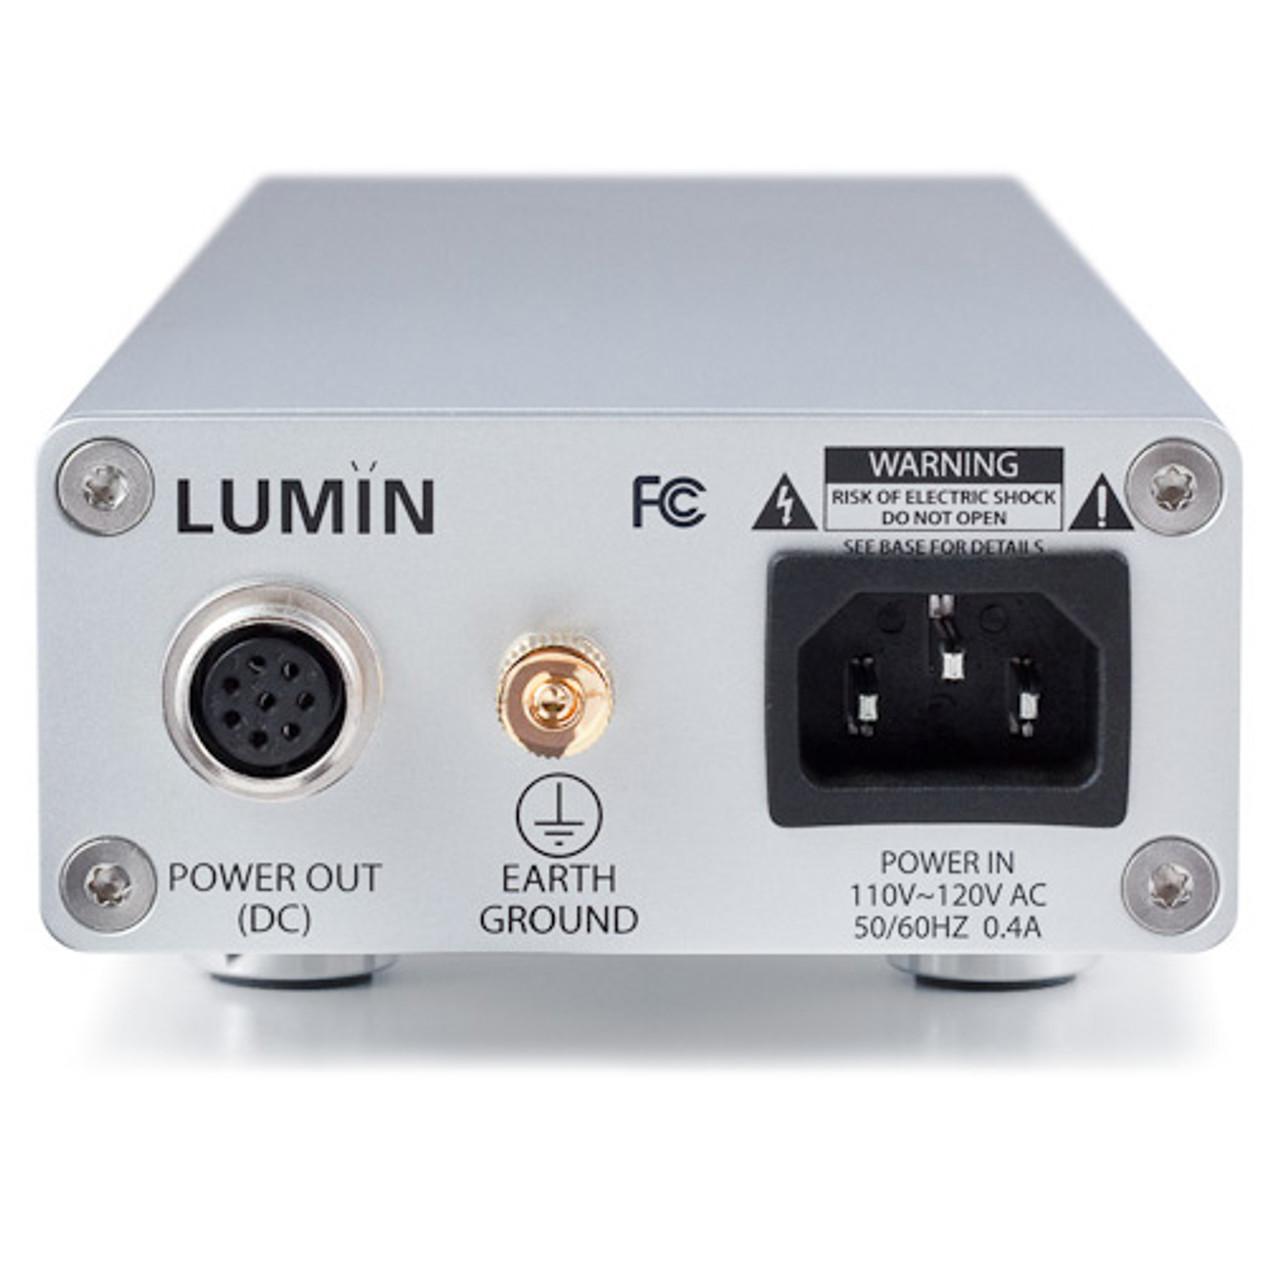 Lumin U1 network music streamer